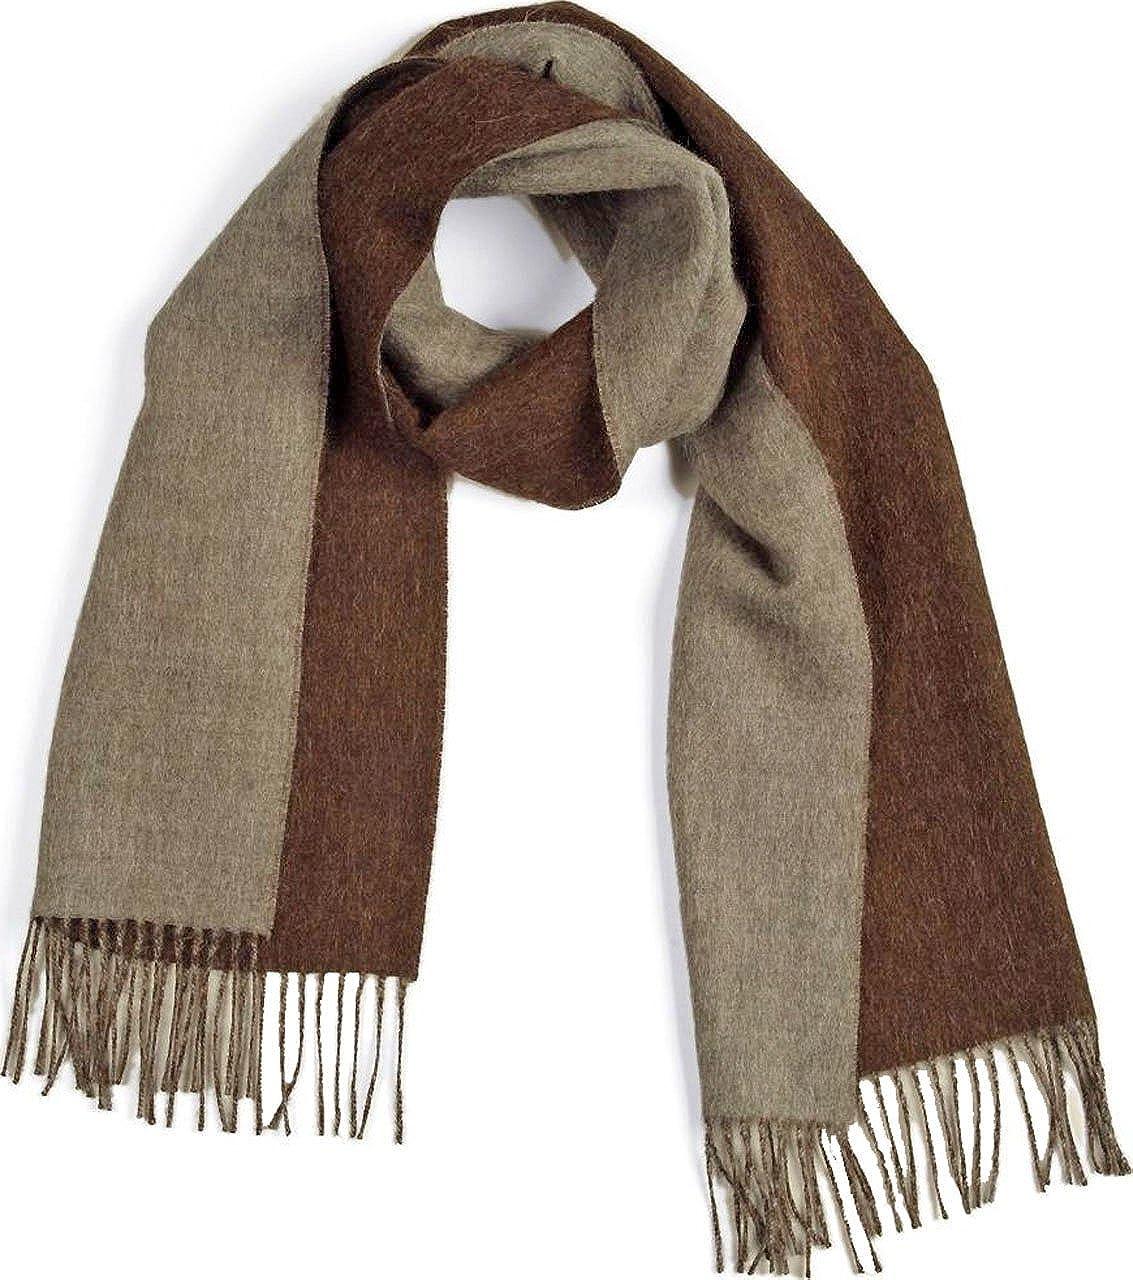 Alpaca Wool Scarf - 100% Pure Baby Alpaca - Double Sided Reversible Contrast Scarf Inca Fashions